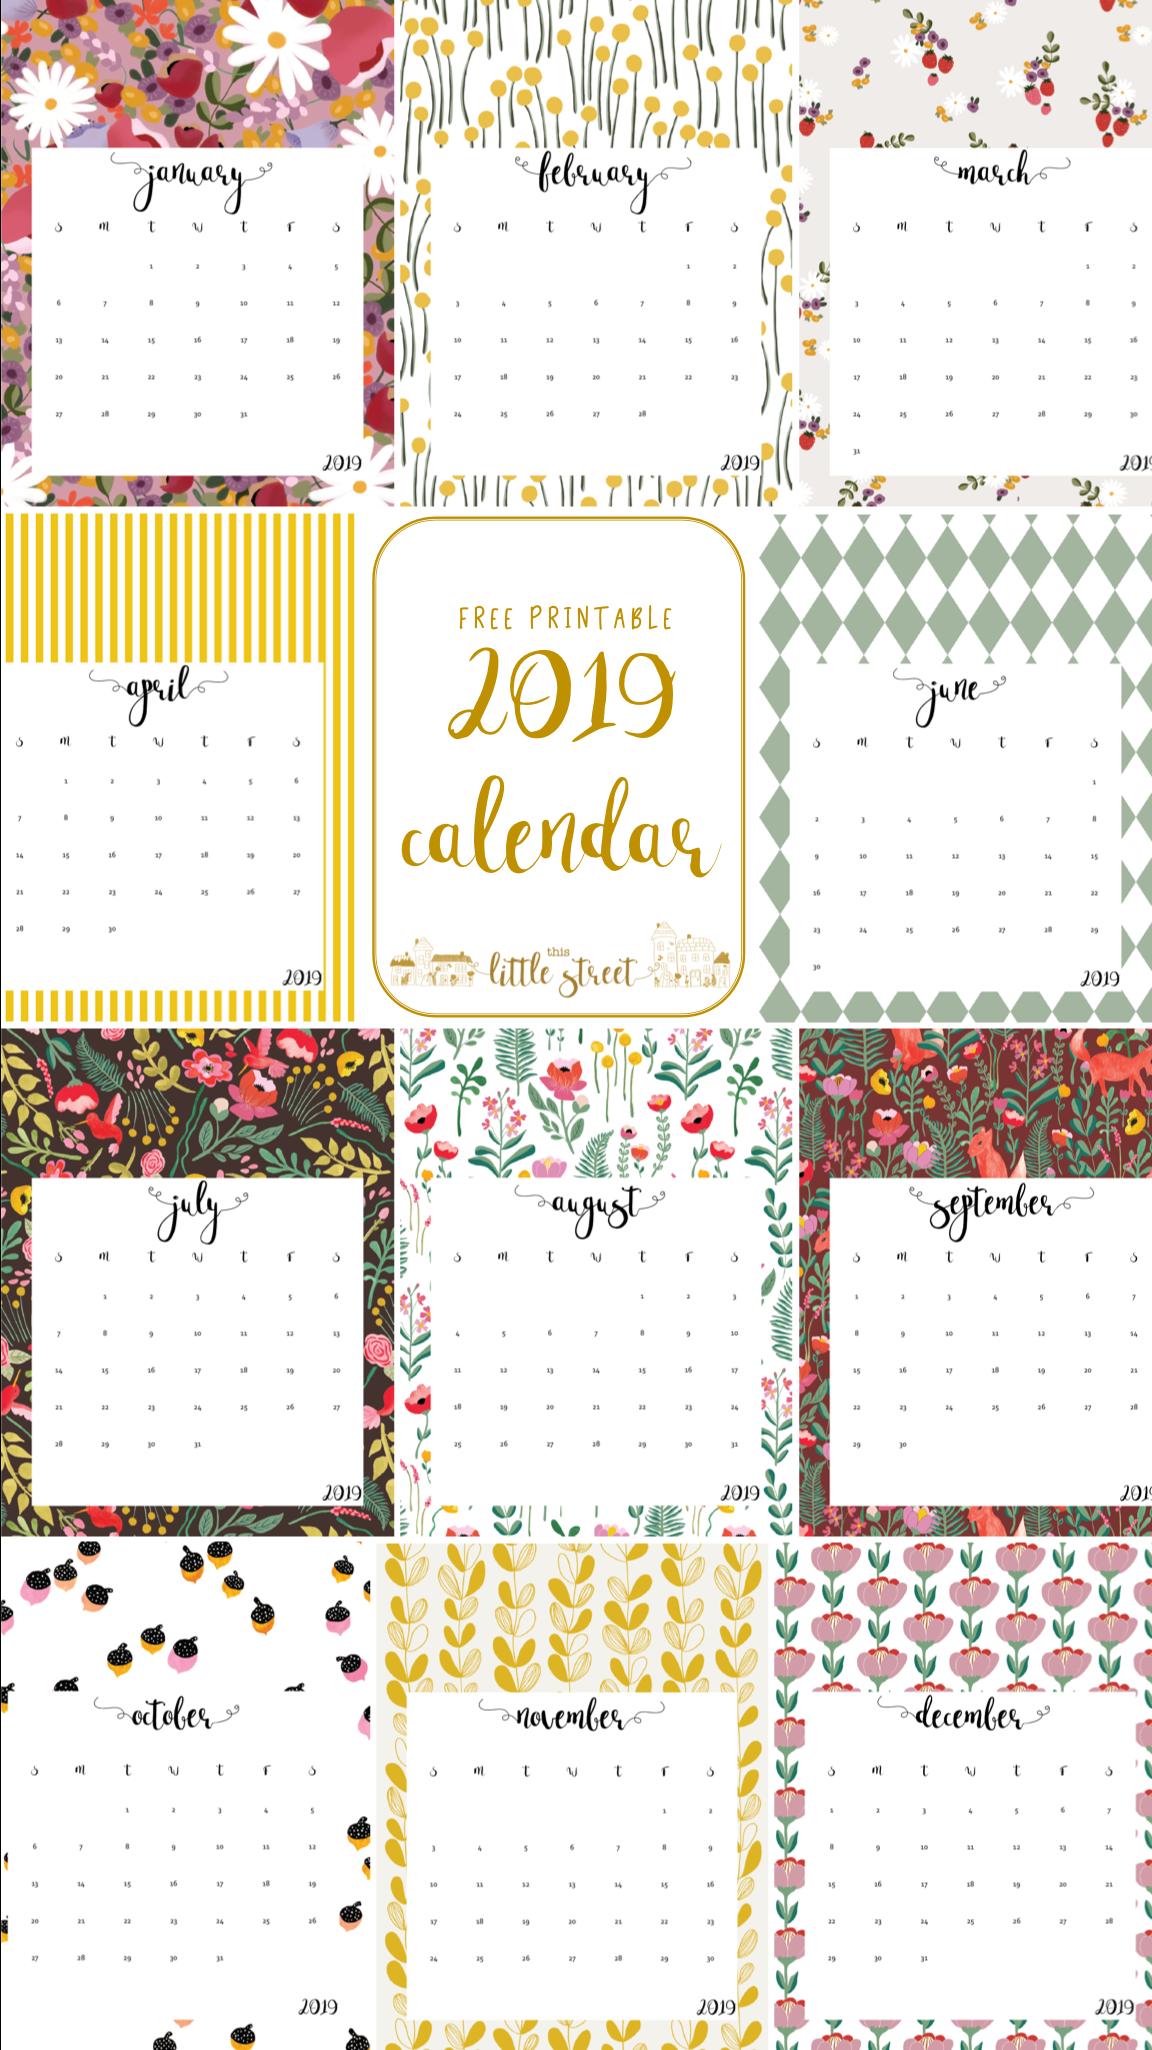 2019 Calendar - Free Printable! | This Little Street : This Little - Free Printables 2019